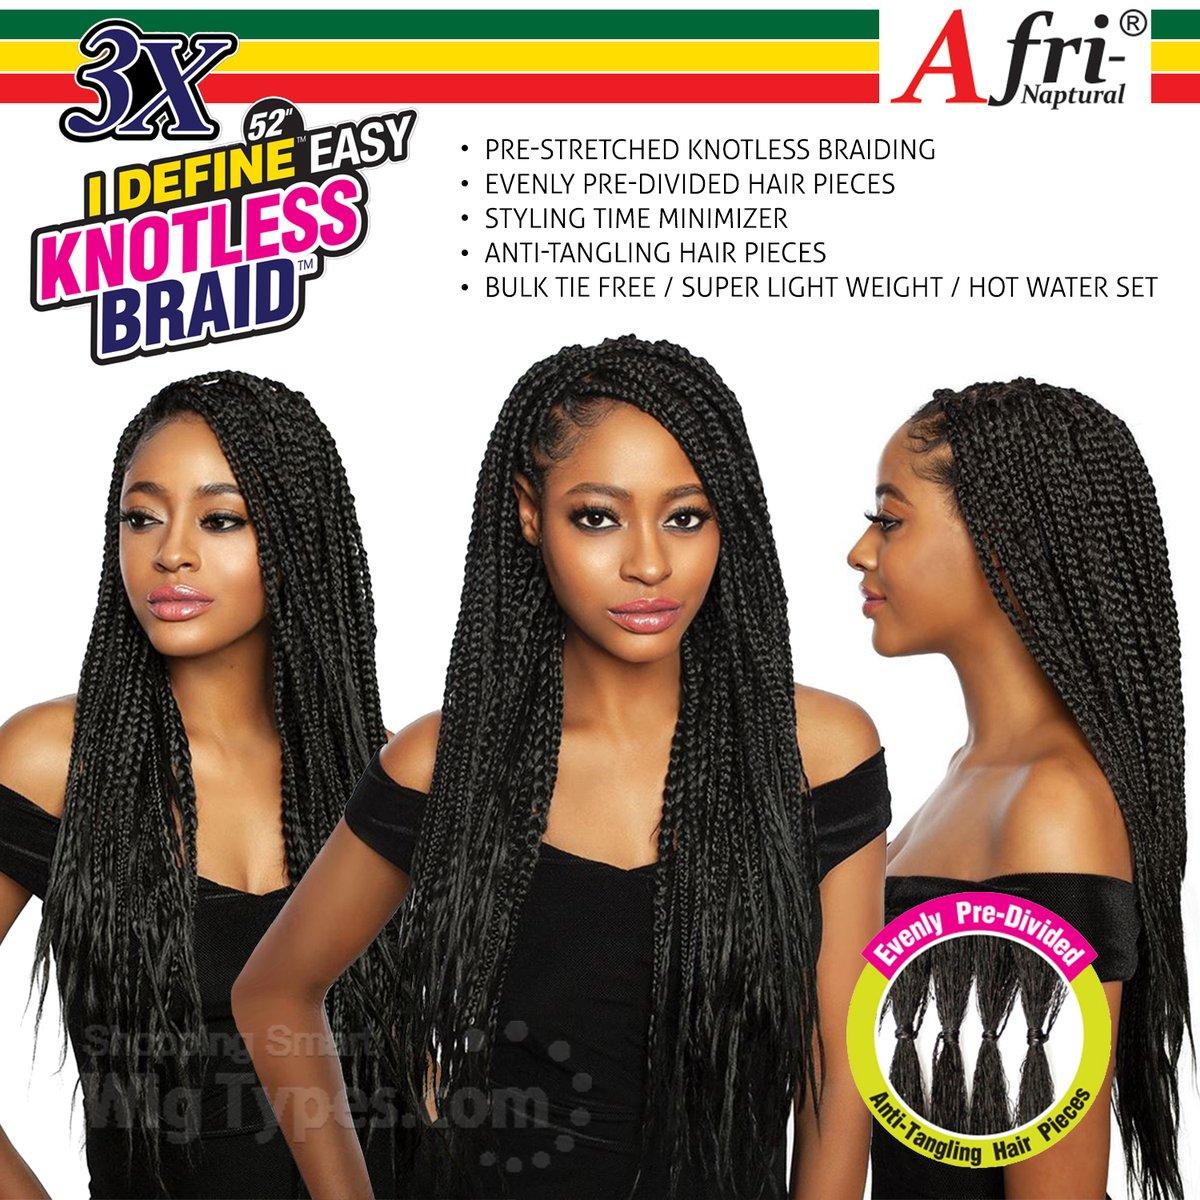 Isis Afri Naptural Synthetic Hair Braid - BRD308 3X I DEFINE EASY KNOTLESS BRAID 52 (https://soo.nr/QRUm)  . . . #wigtypes #wigtypesdotcom #trendyhair #protectivestyles #blackgirlhair #instahair #Longbraid #syntheticbraid #isisafribraid #brd308 #3xidefineeasyknotlessbraid52pic.twitter.com/D0eHYWn5pU